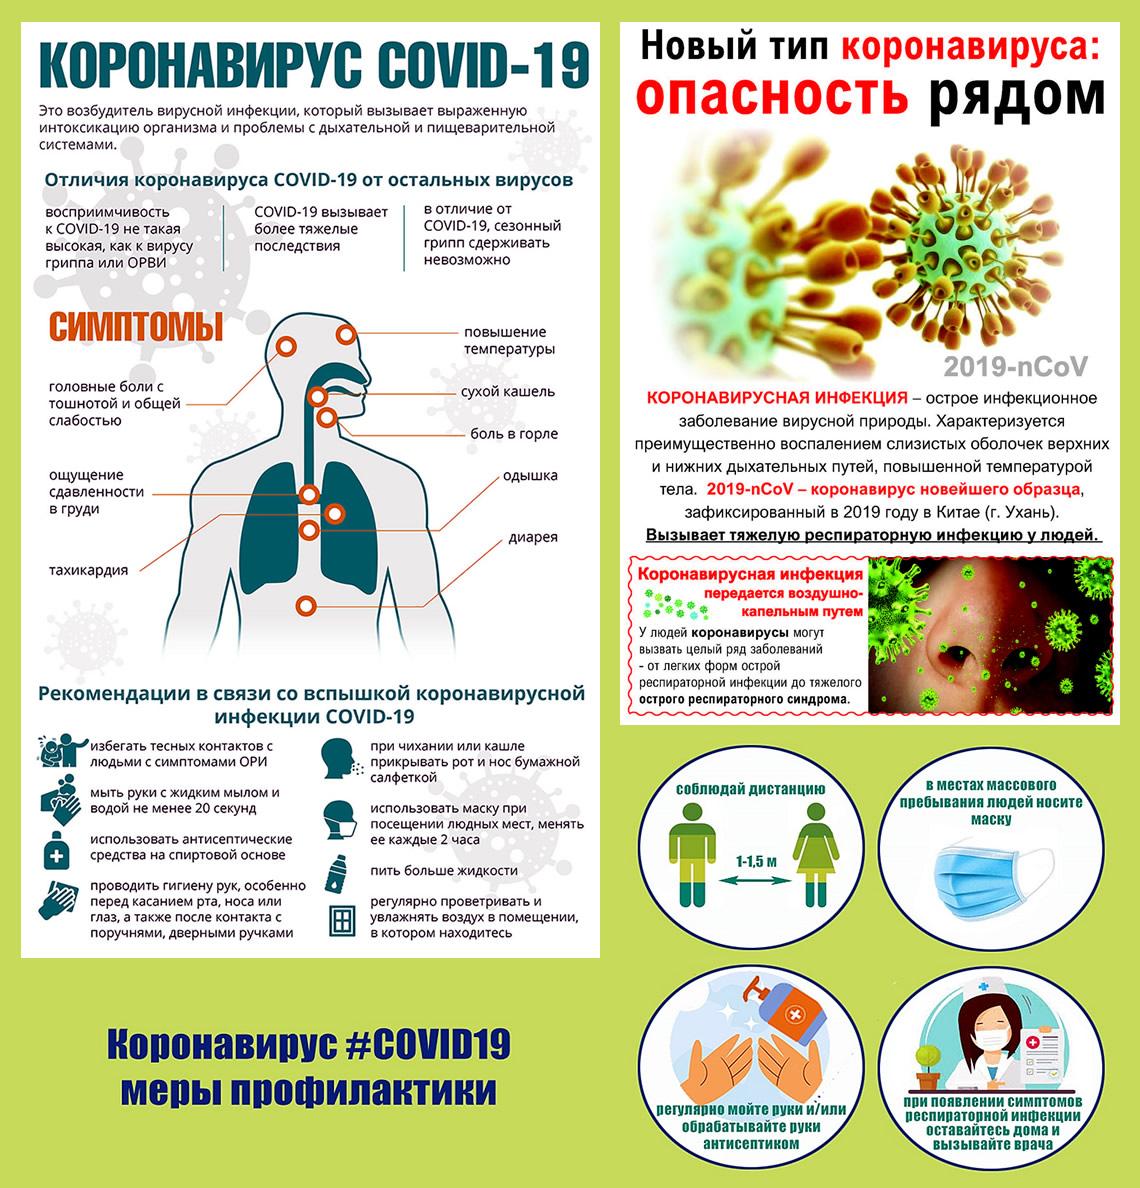 Памятки по профилактике коронавируса